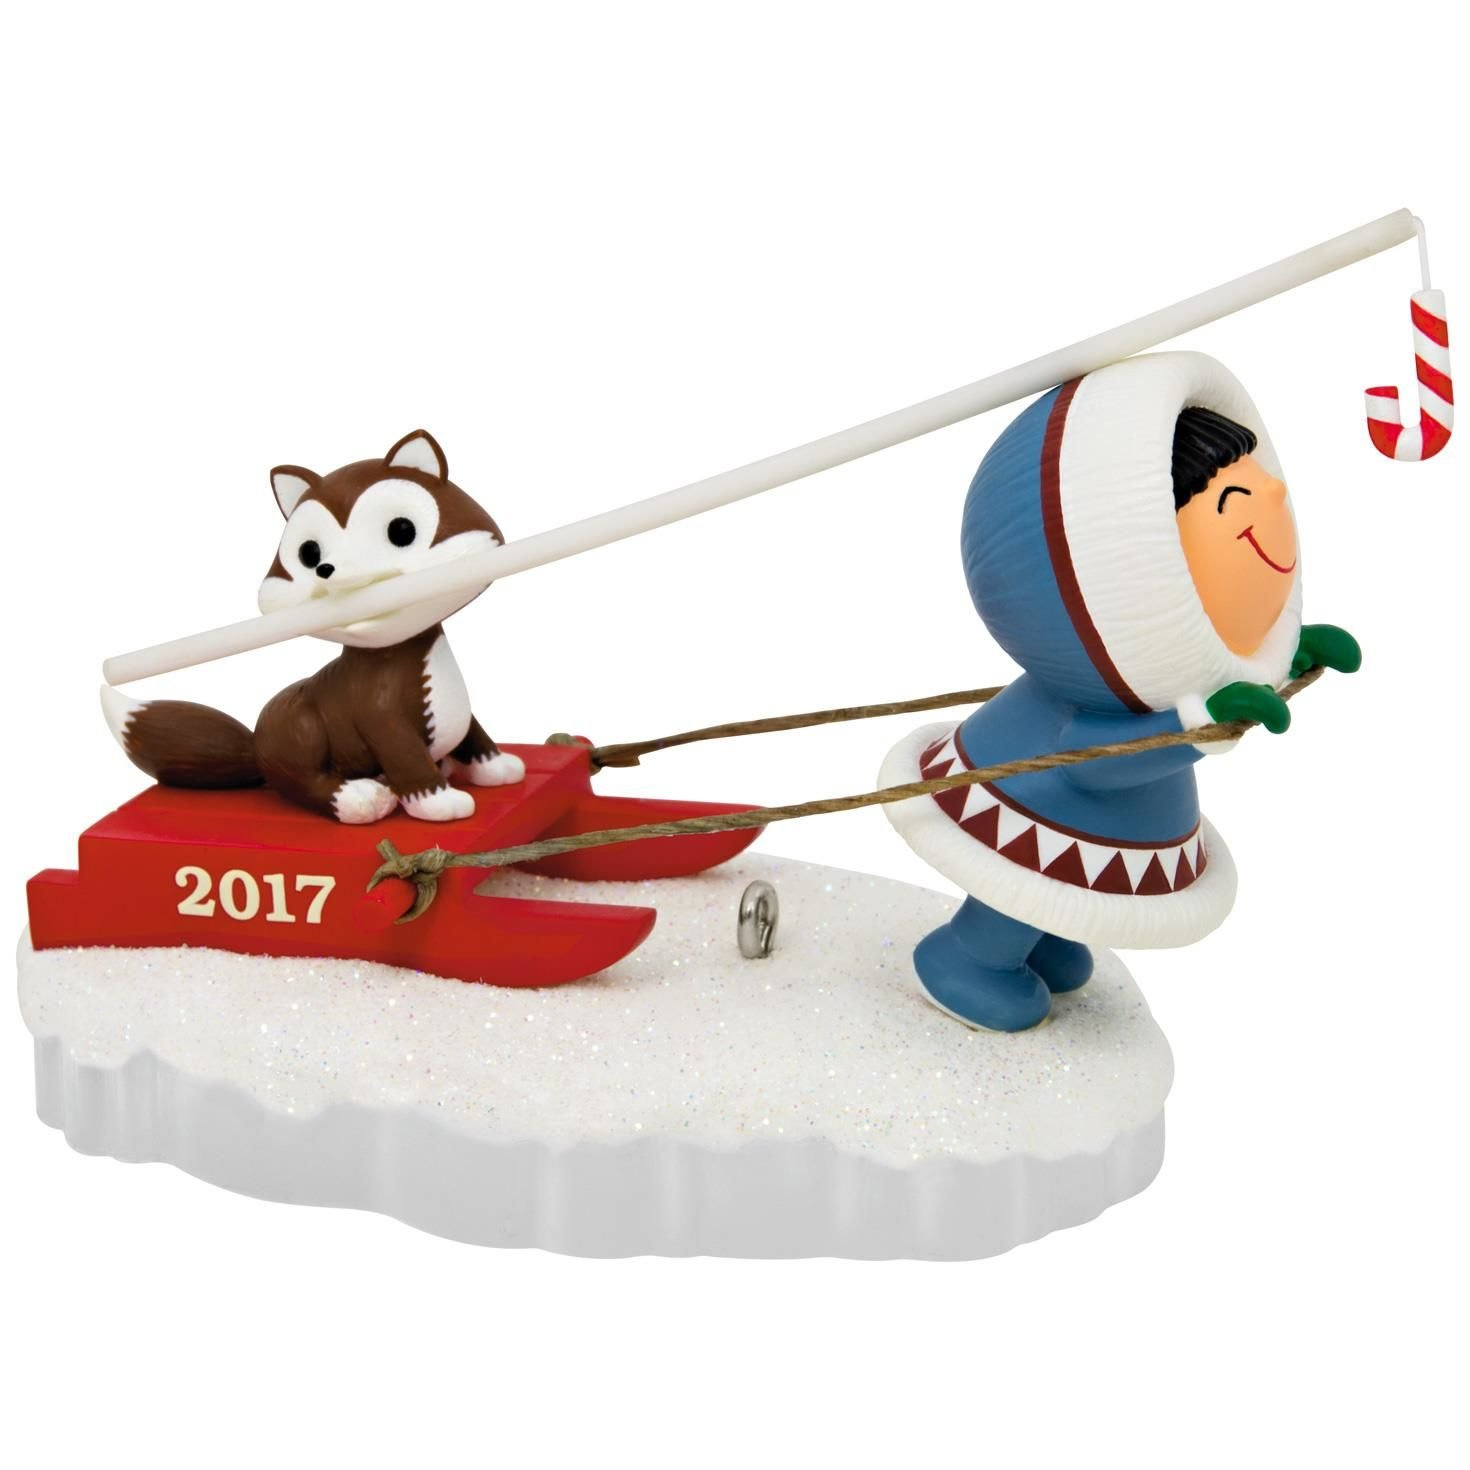 Hallmark Keepsake 2017 Frosty Friends Dog Sled Christmas Ornament